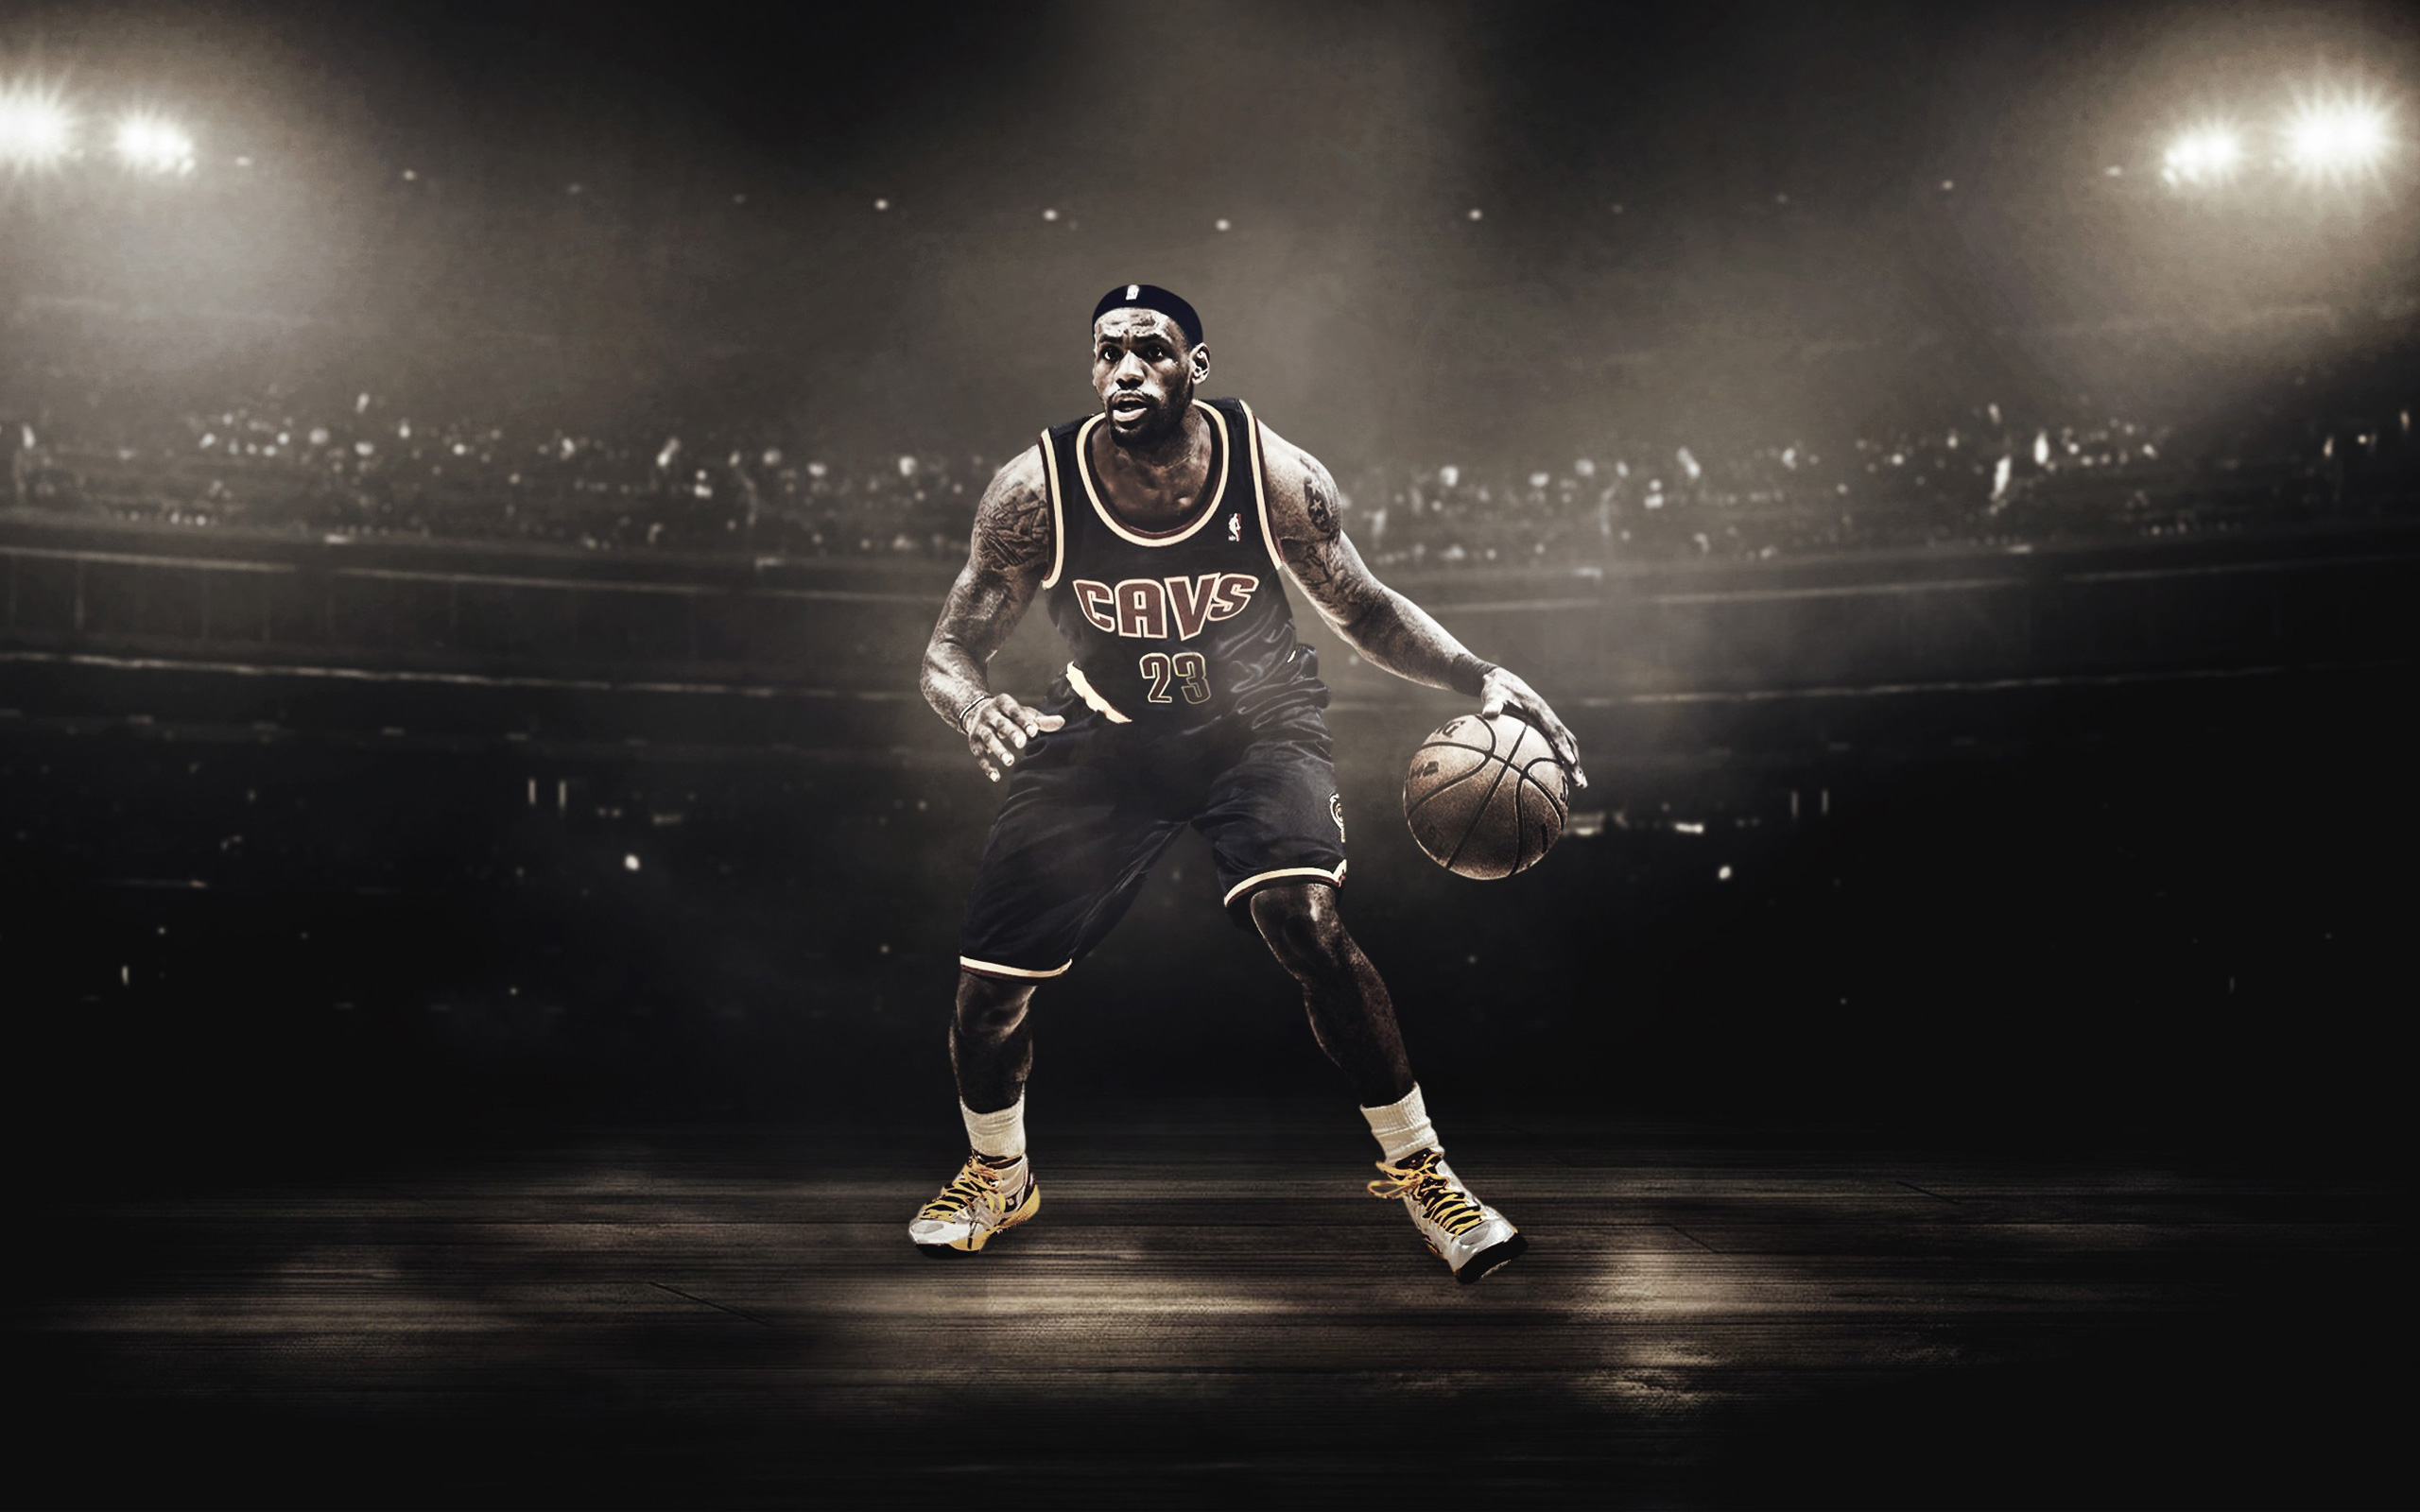 LeBron James Basketball Player HD Wallpaper   iHD Wallpapers 2560x1600